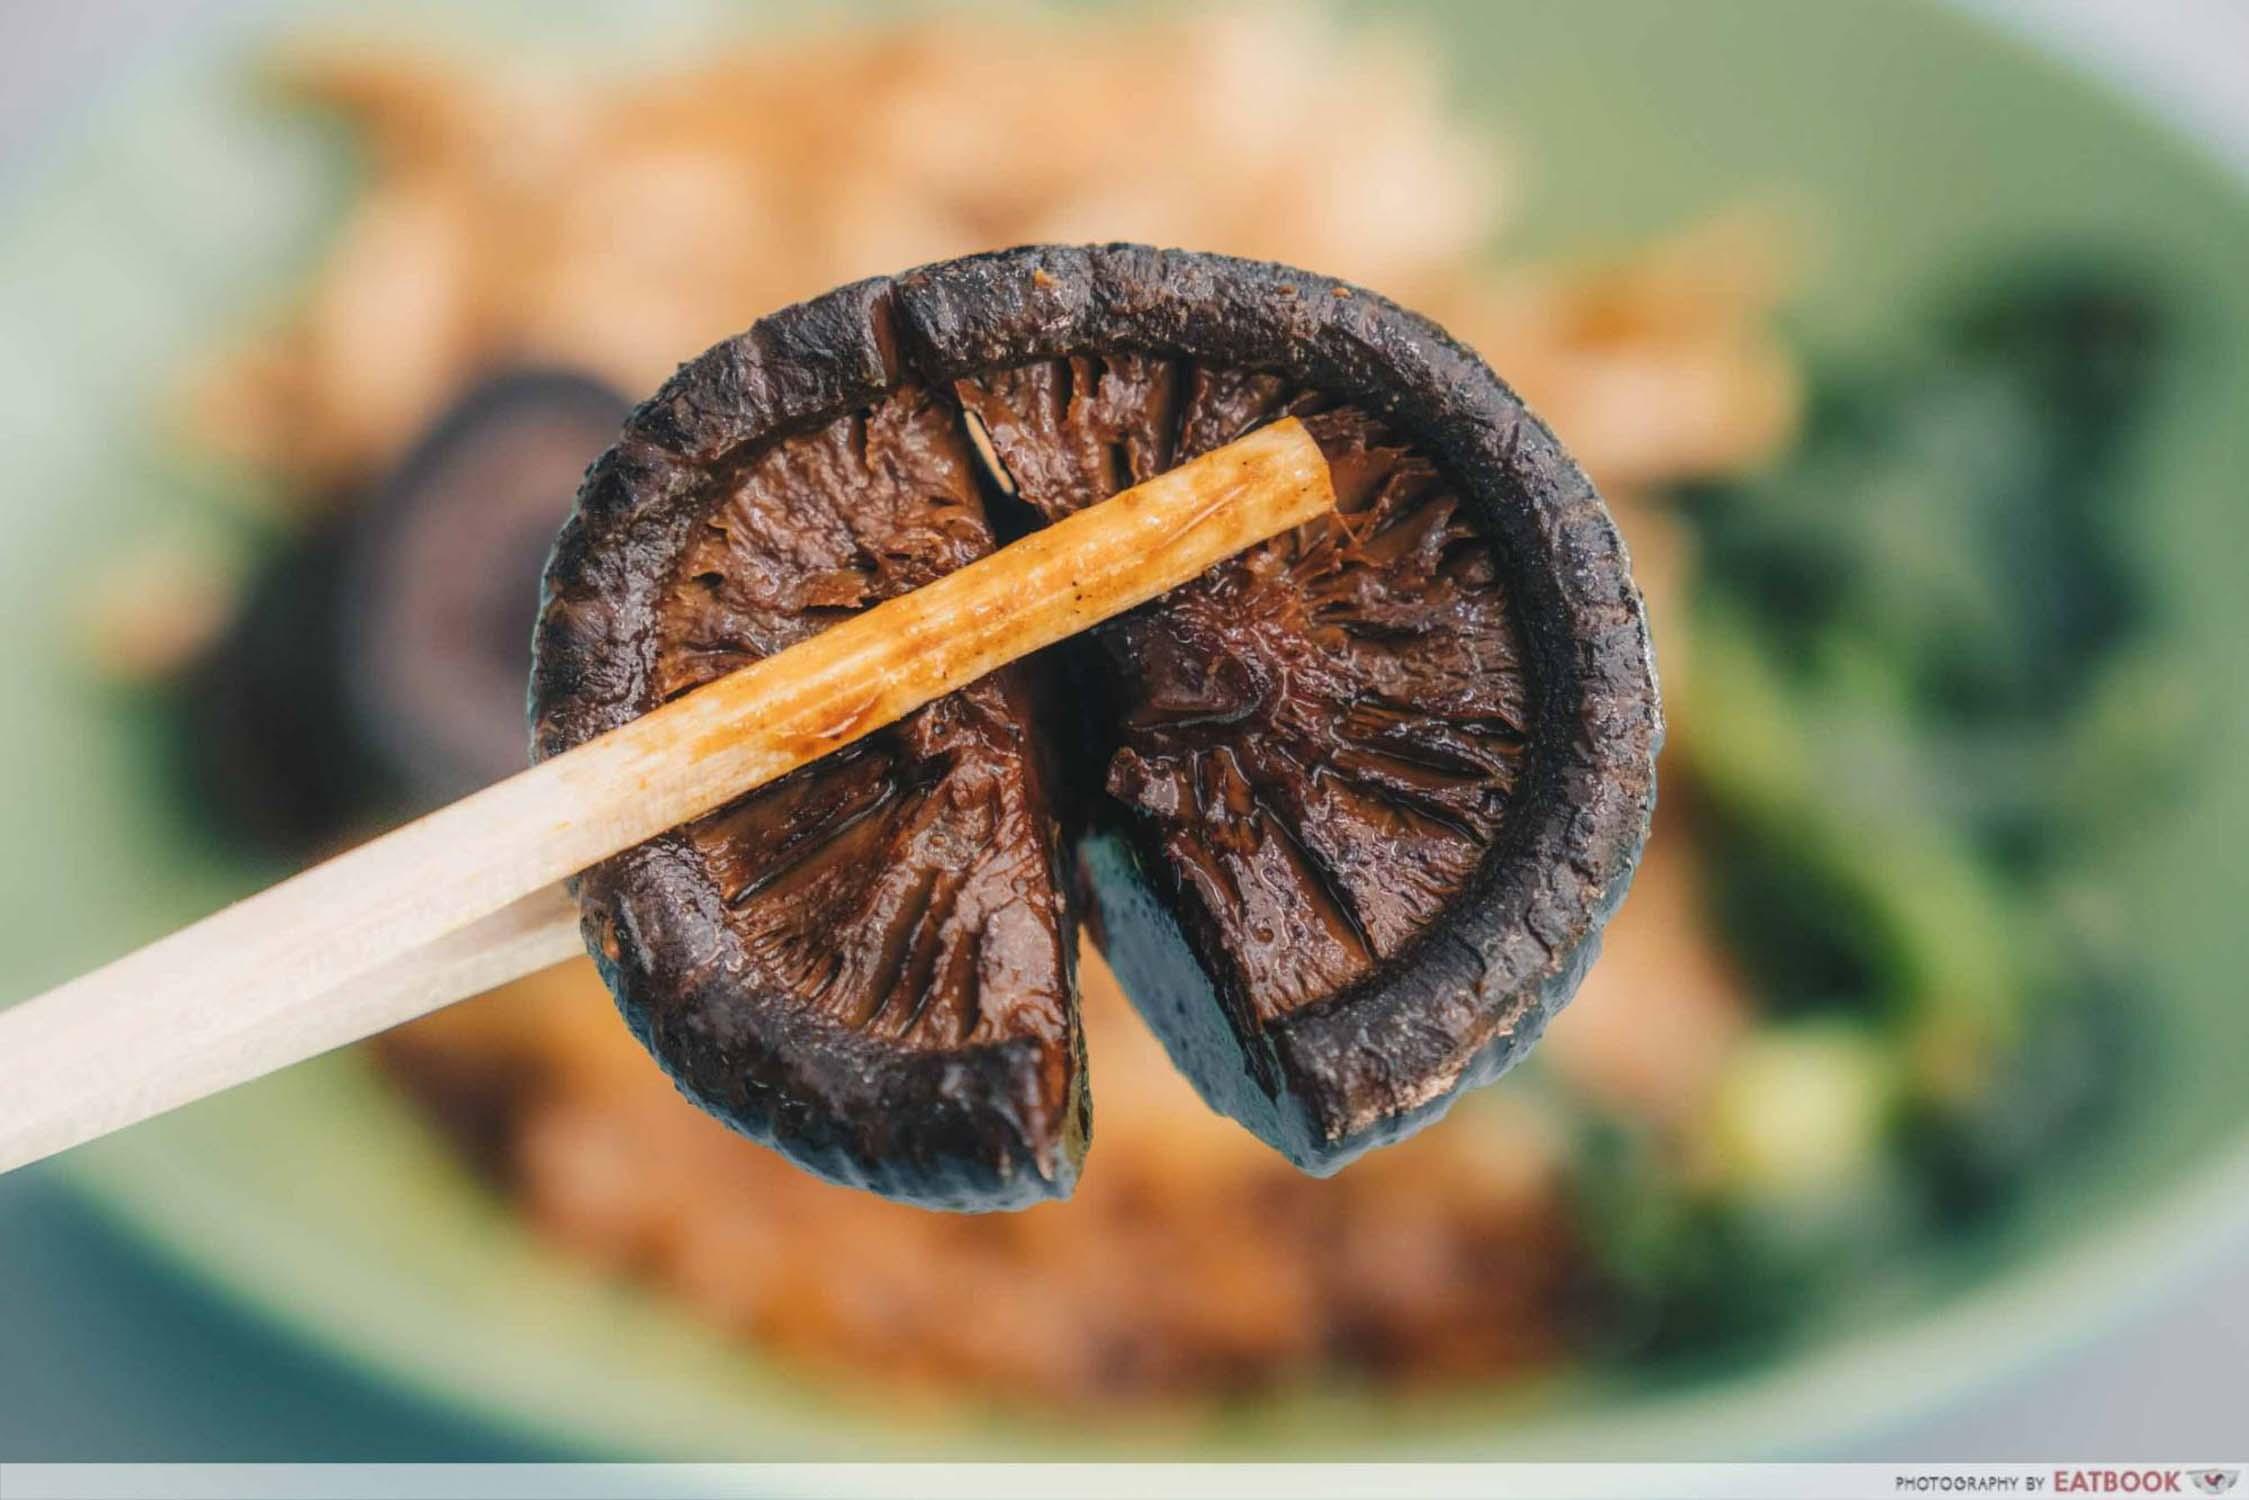 Cantonese Delights - Shiitake Mushroom Closeup